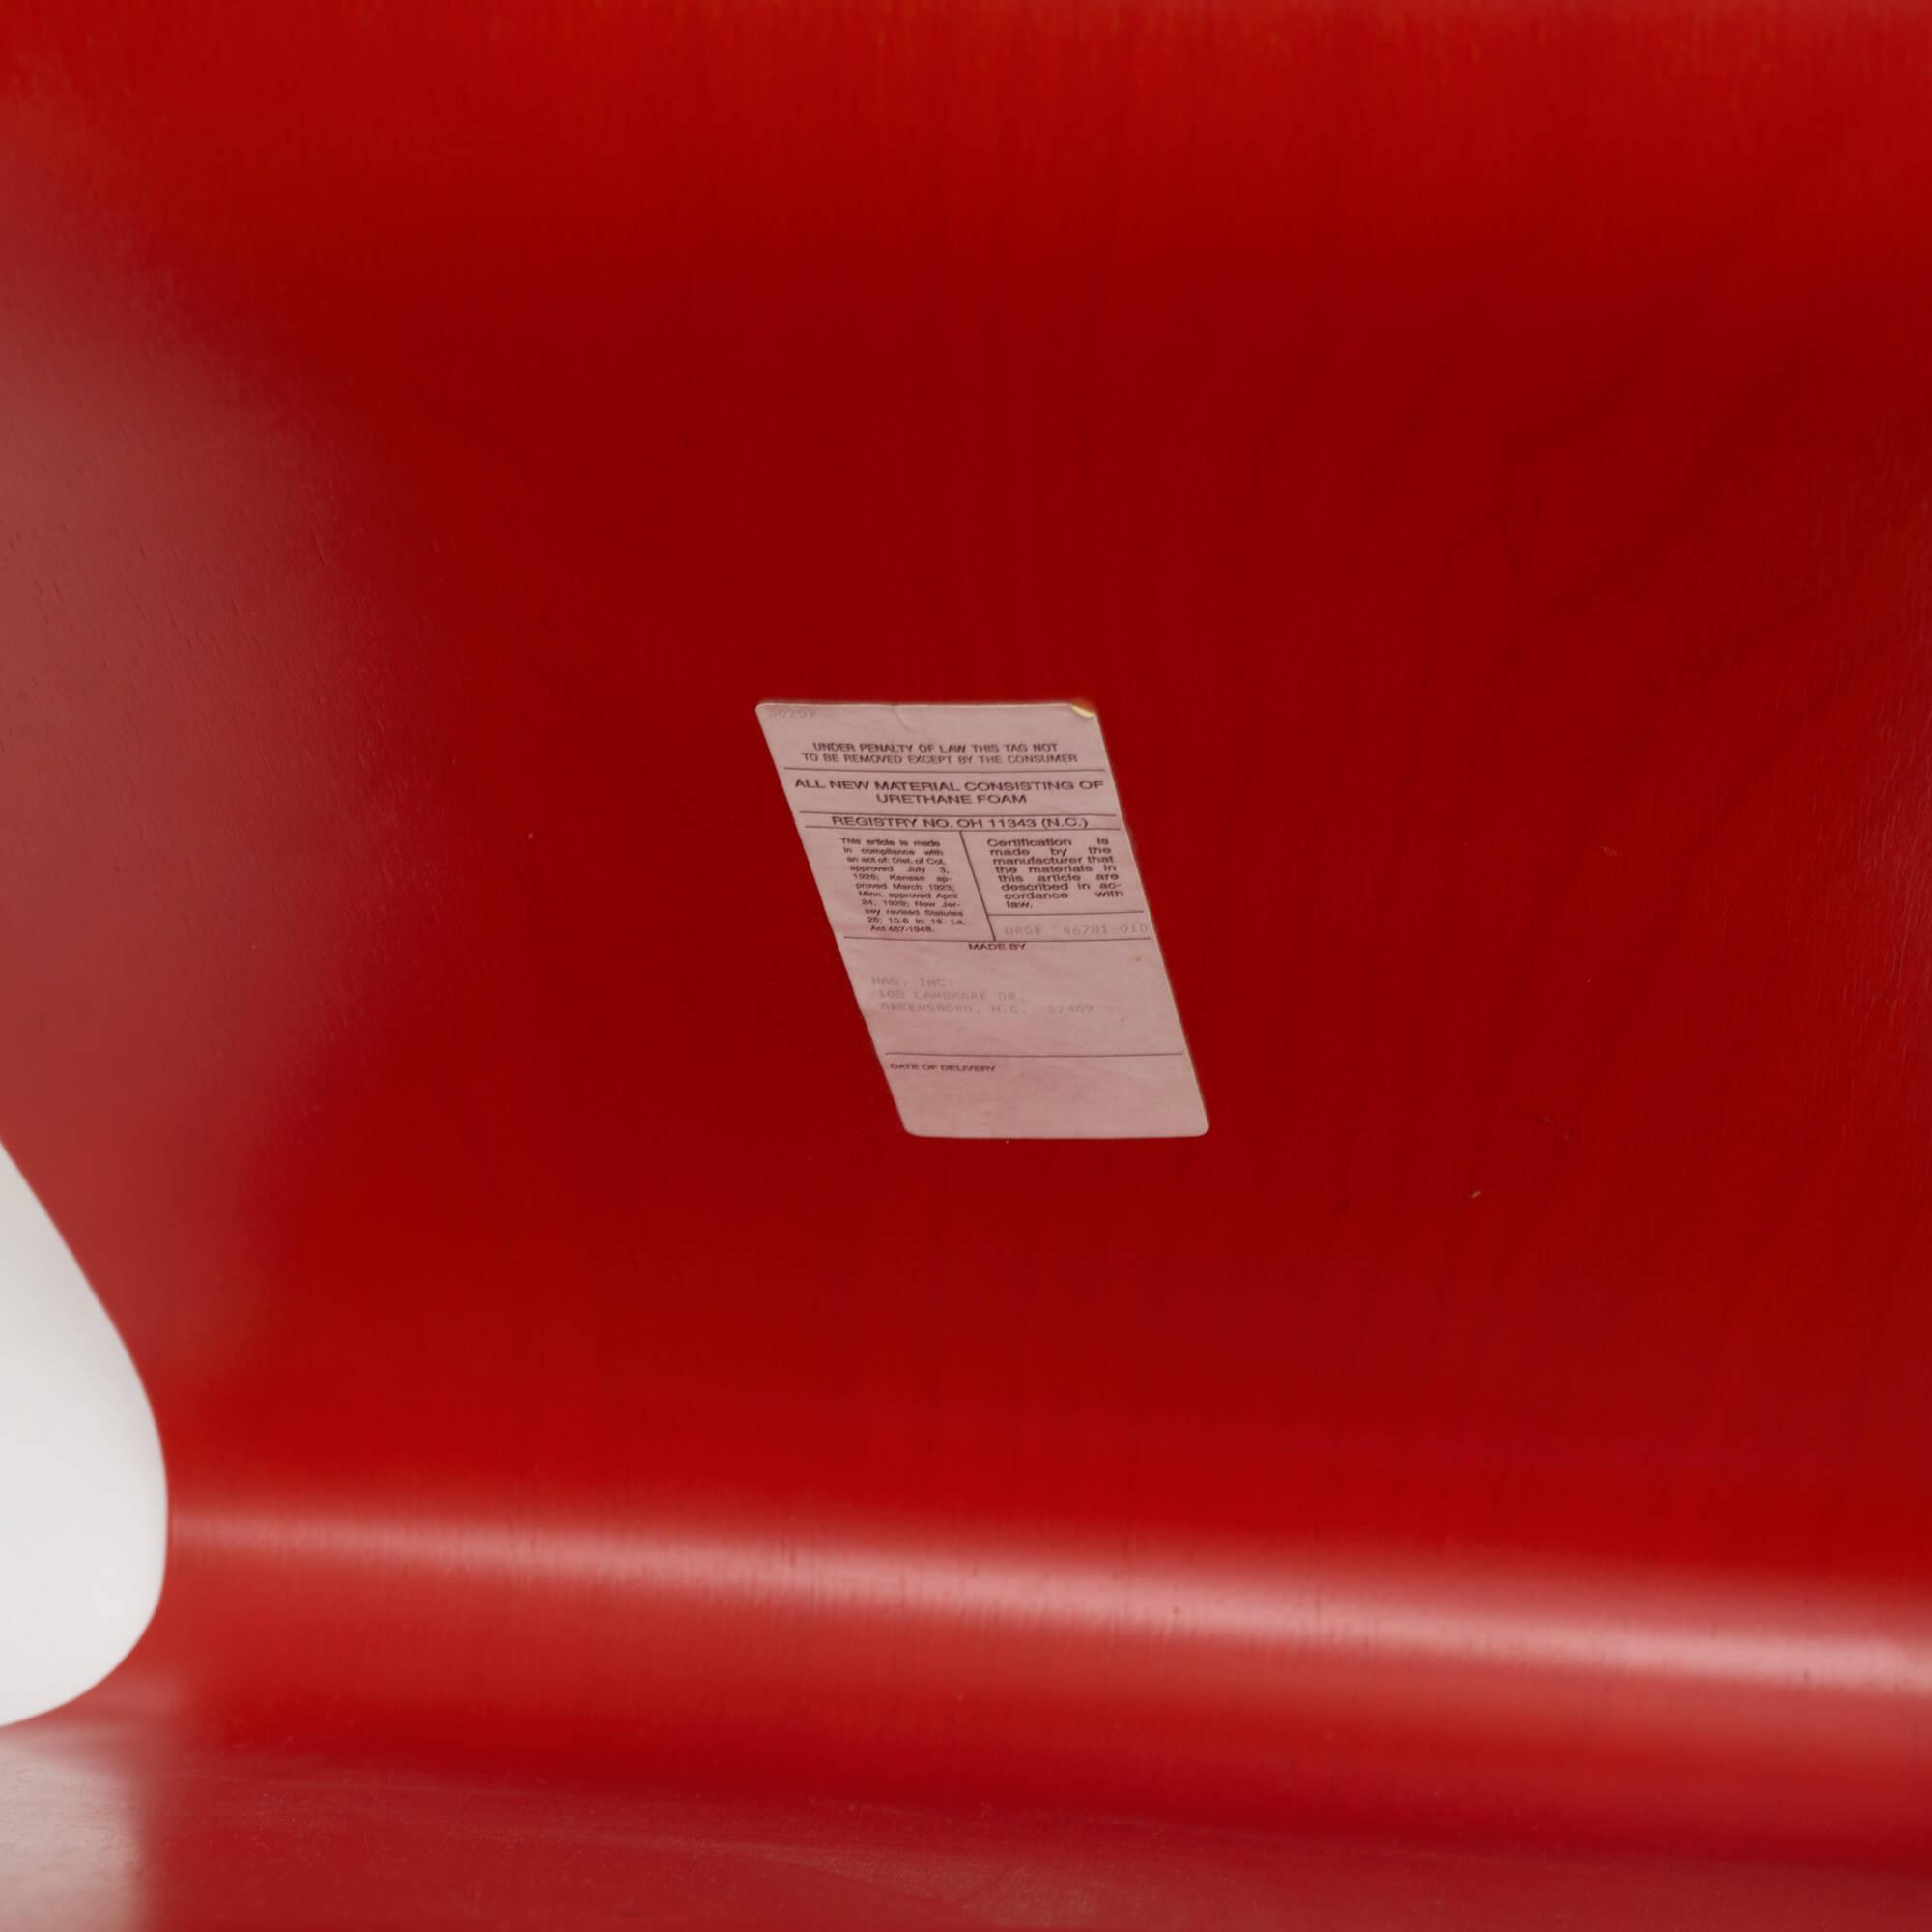 243: Verner Panton / Pantonic 5010 chair (4 of 4)